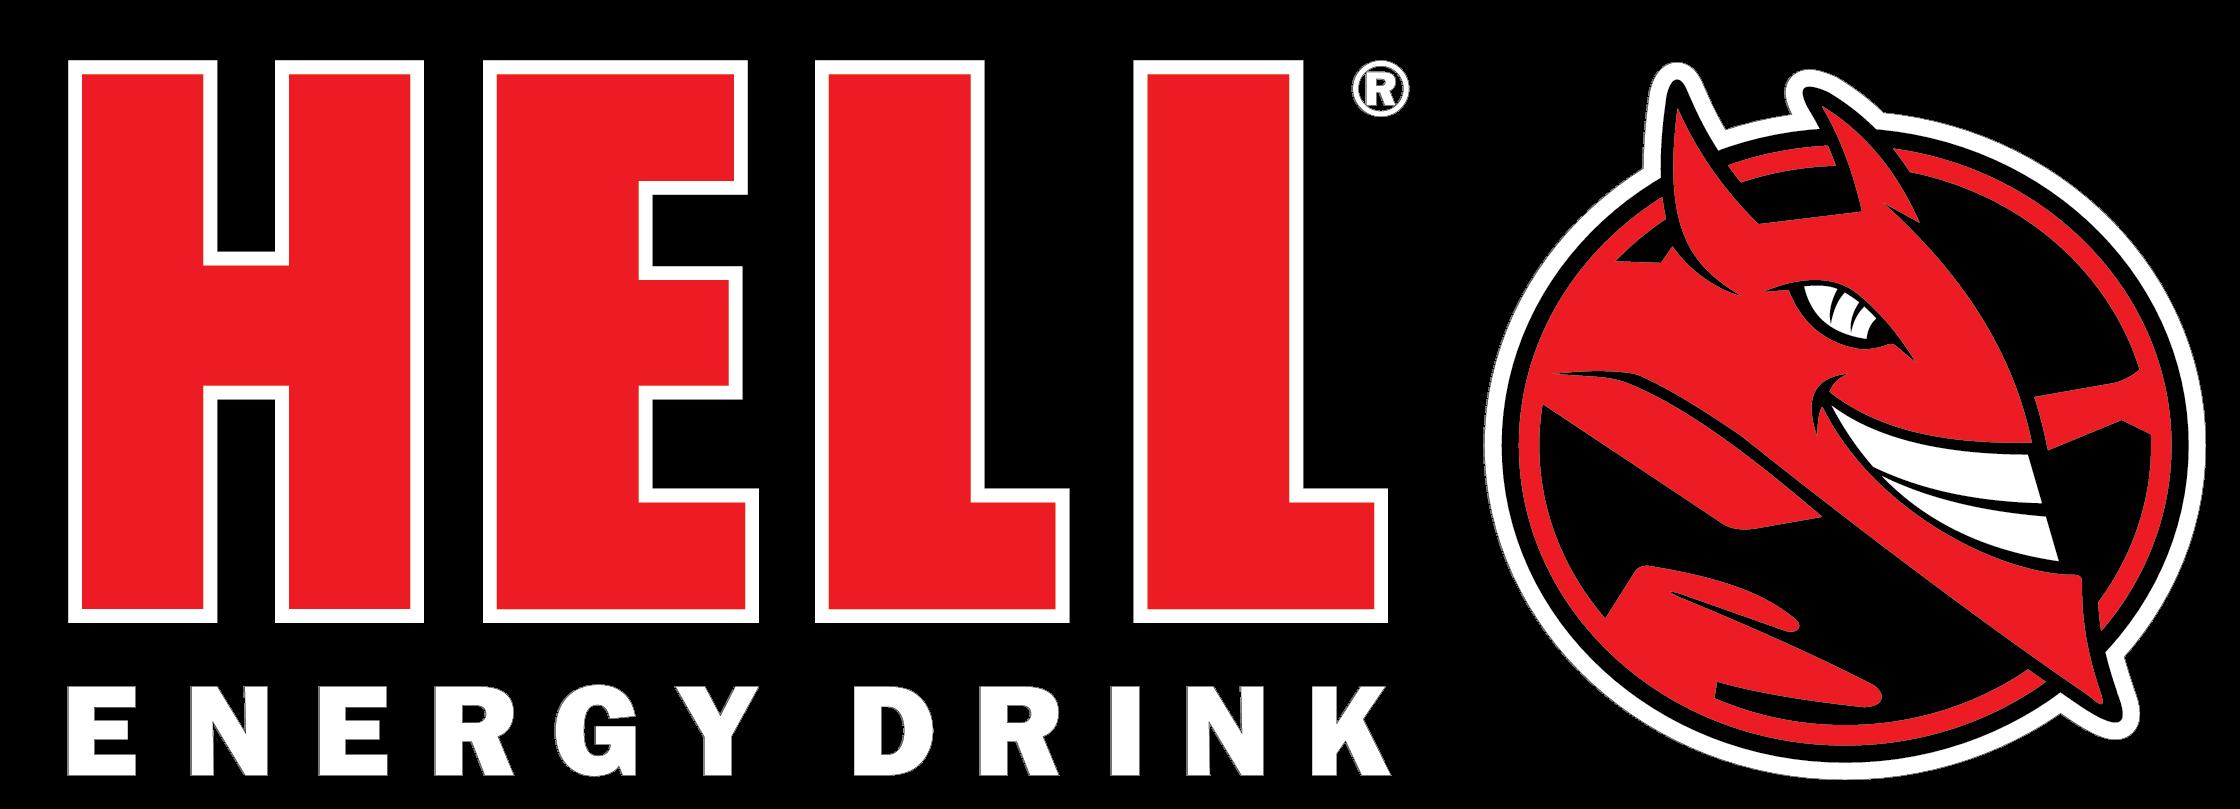 HELL ENERGY DRINK